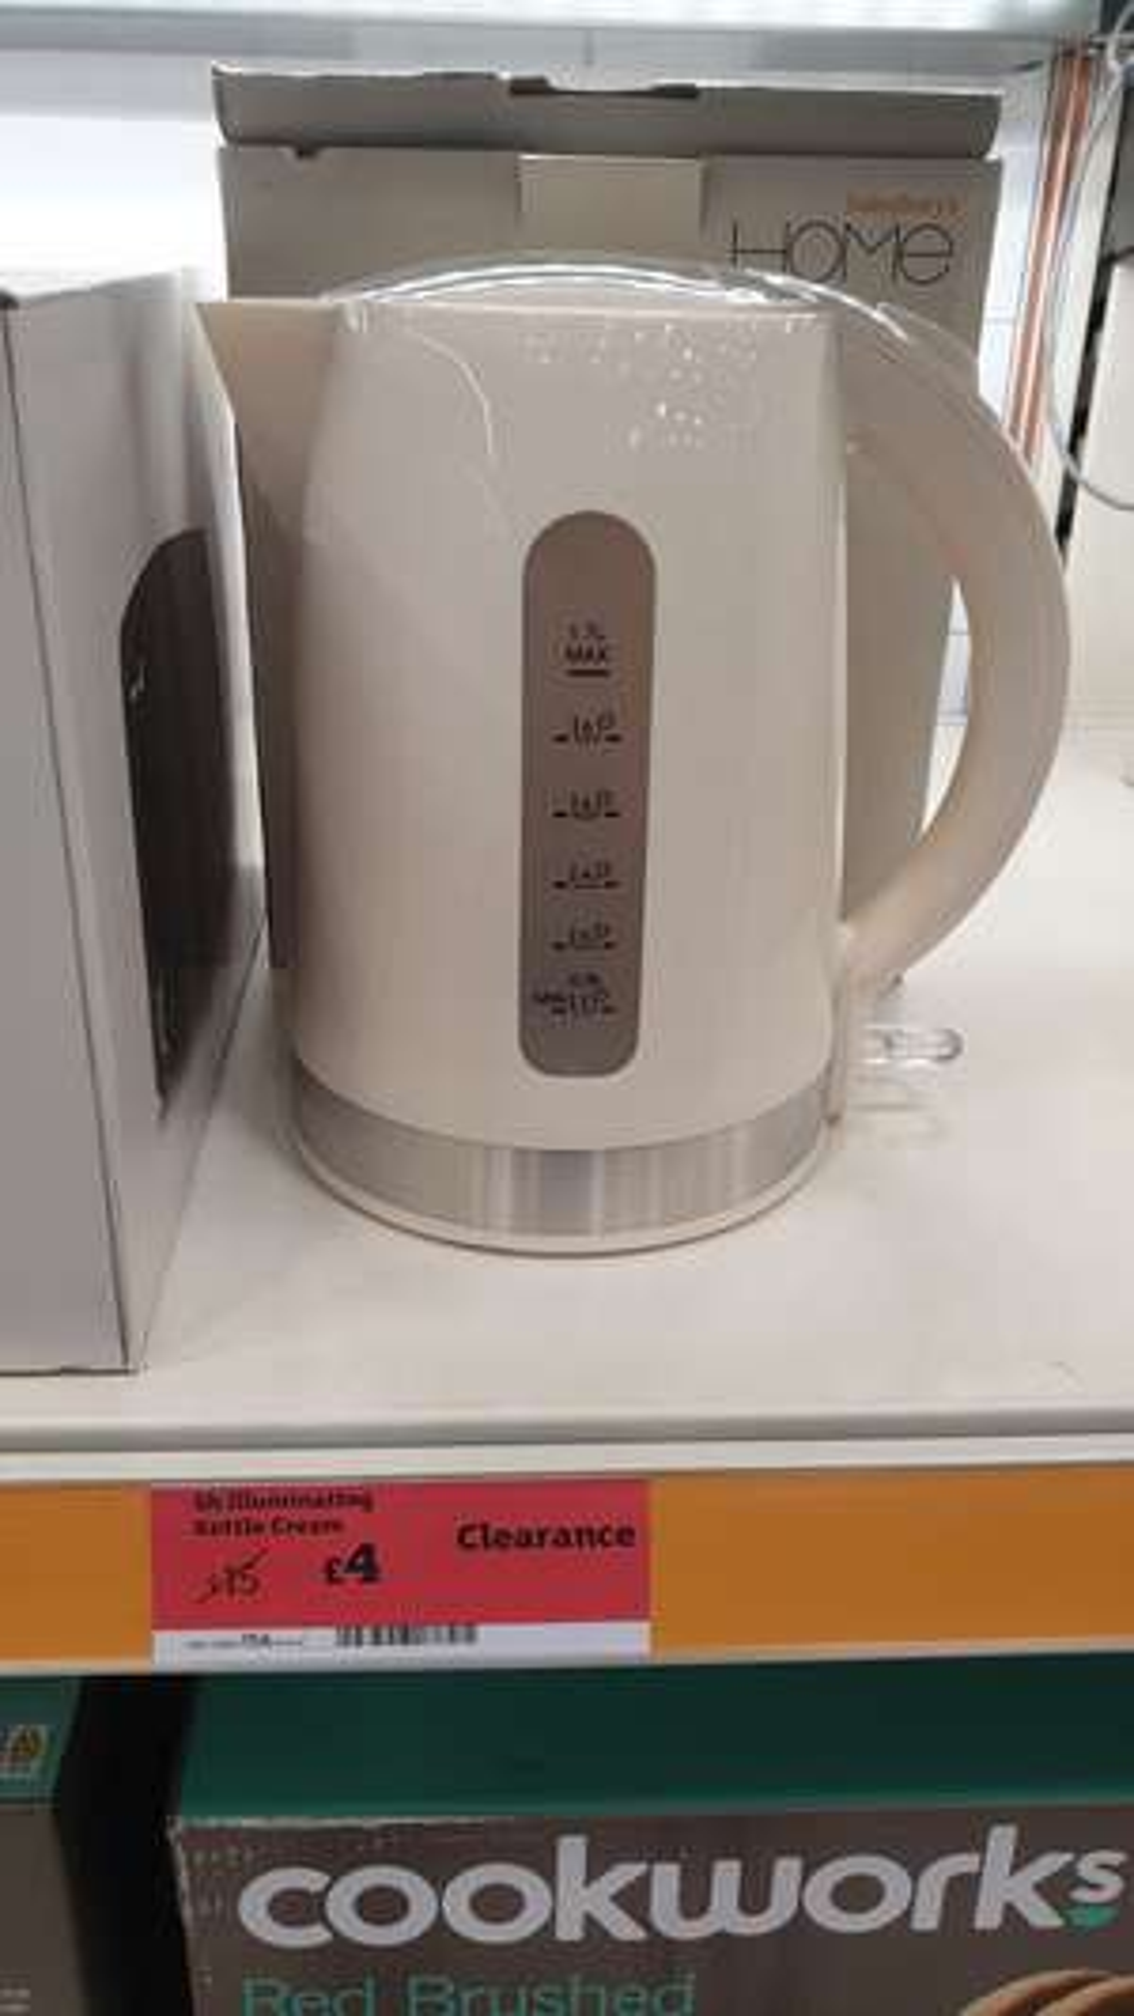 Sainsbury's Home illuminating kettle £4 (Carlisle)